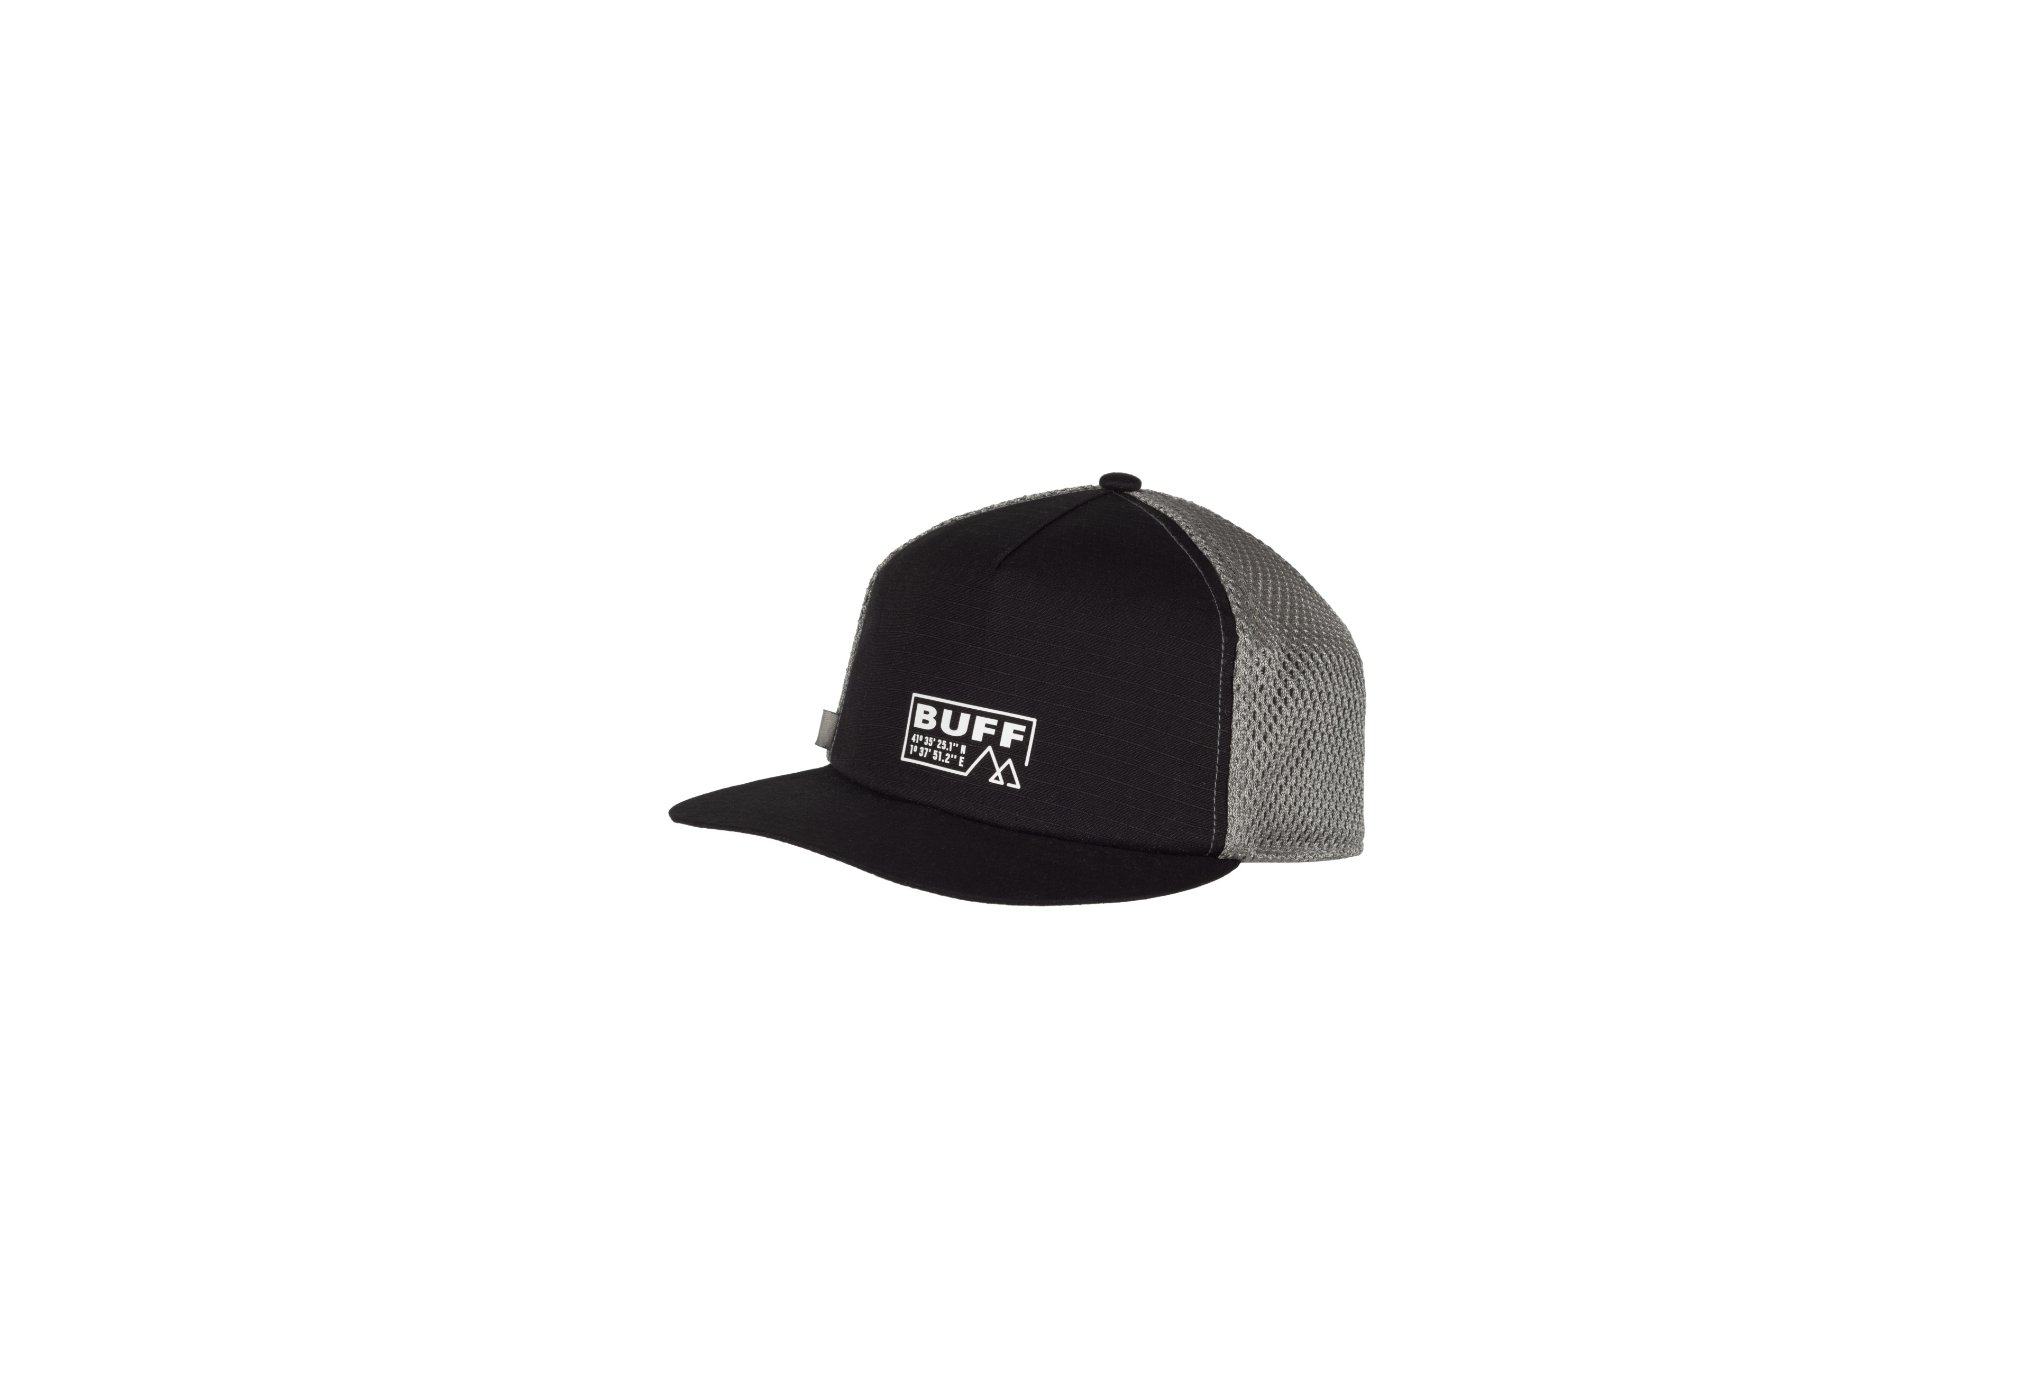 Buff Pack Trucker Cap Solid Black Casquettes / bandeaux